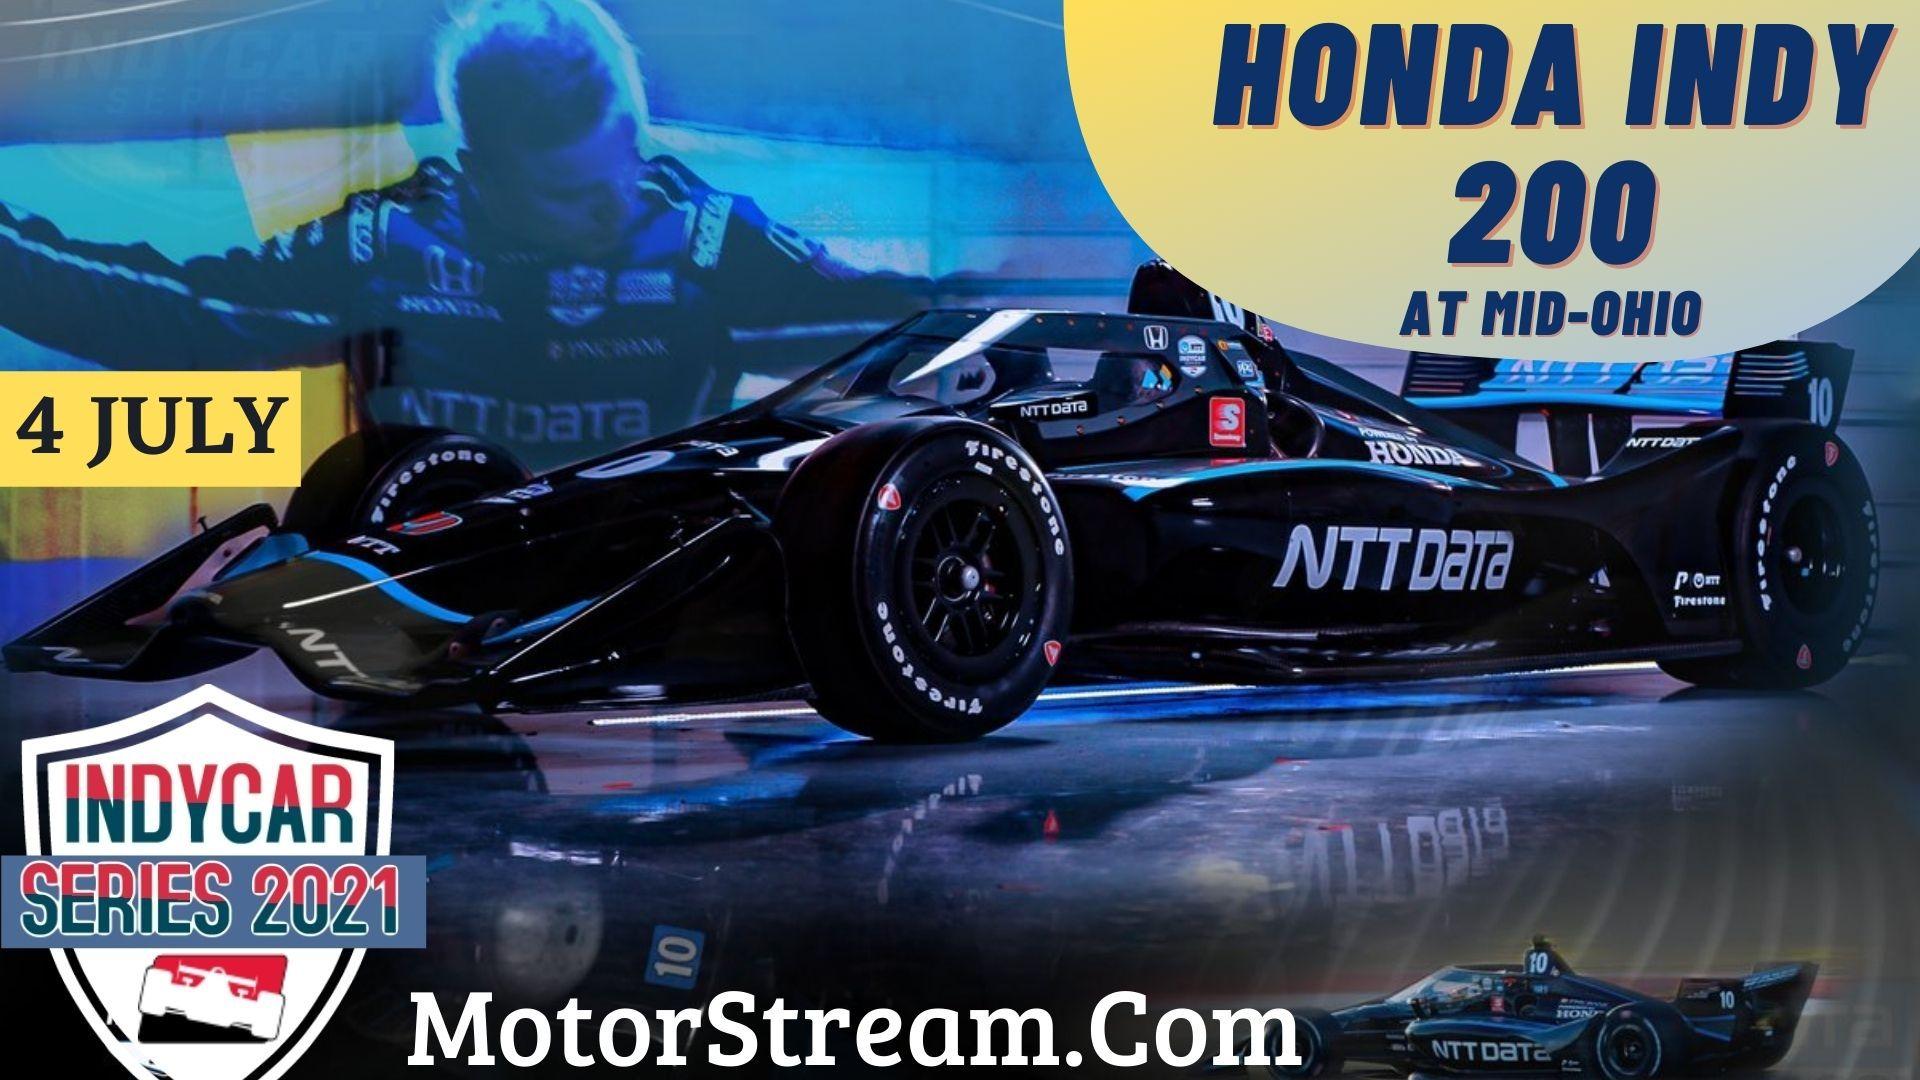 Honda Indy 200 at Mid-Ohio Live Stream 2021